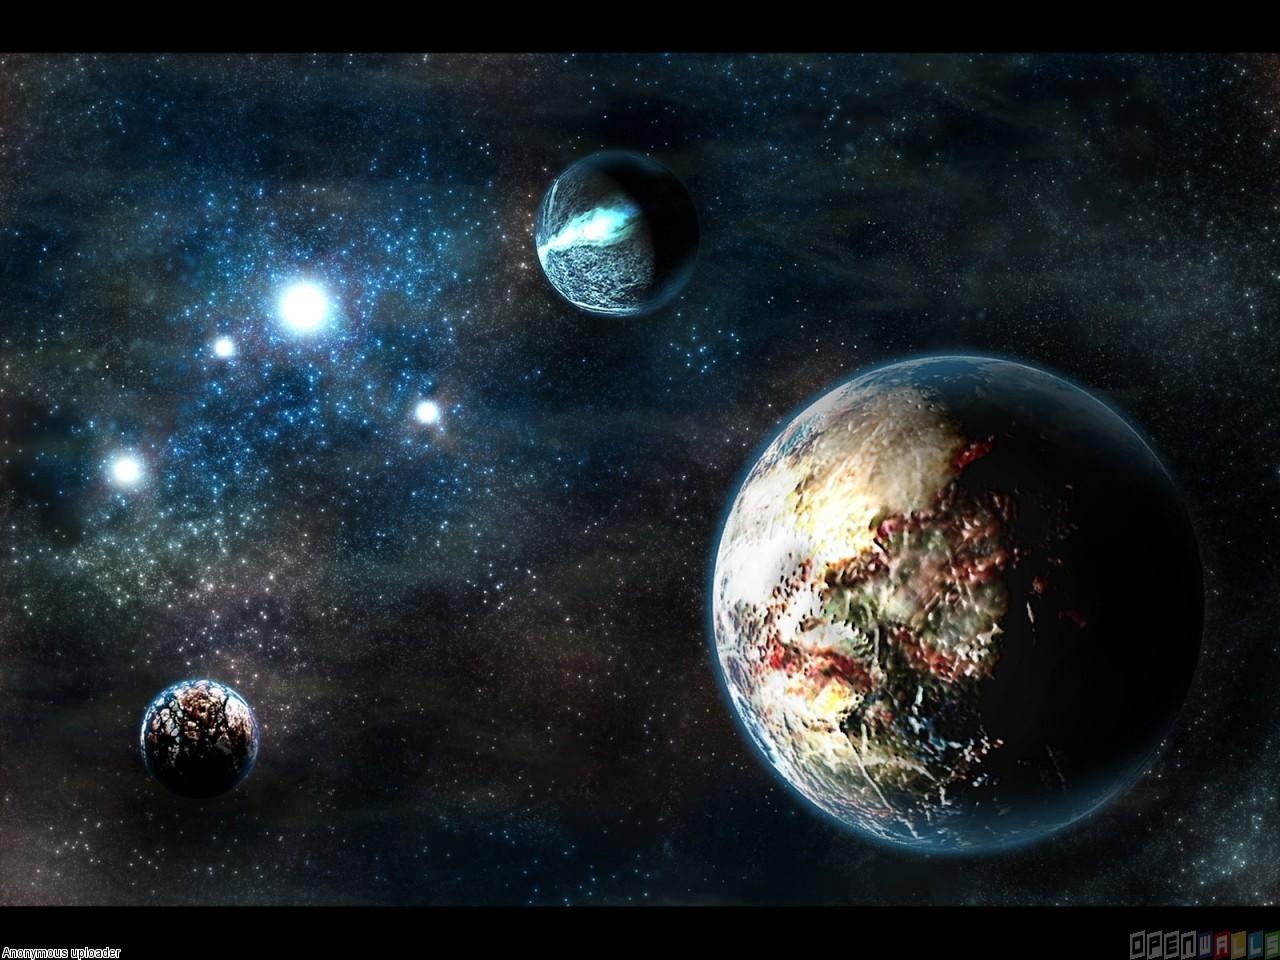 Deep space wallpaper #14896 - Open Walls